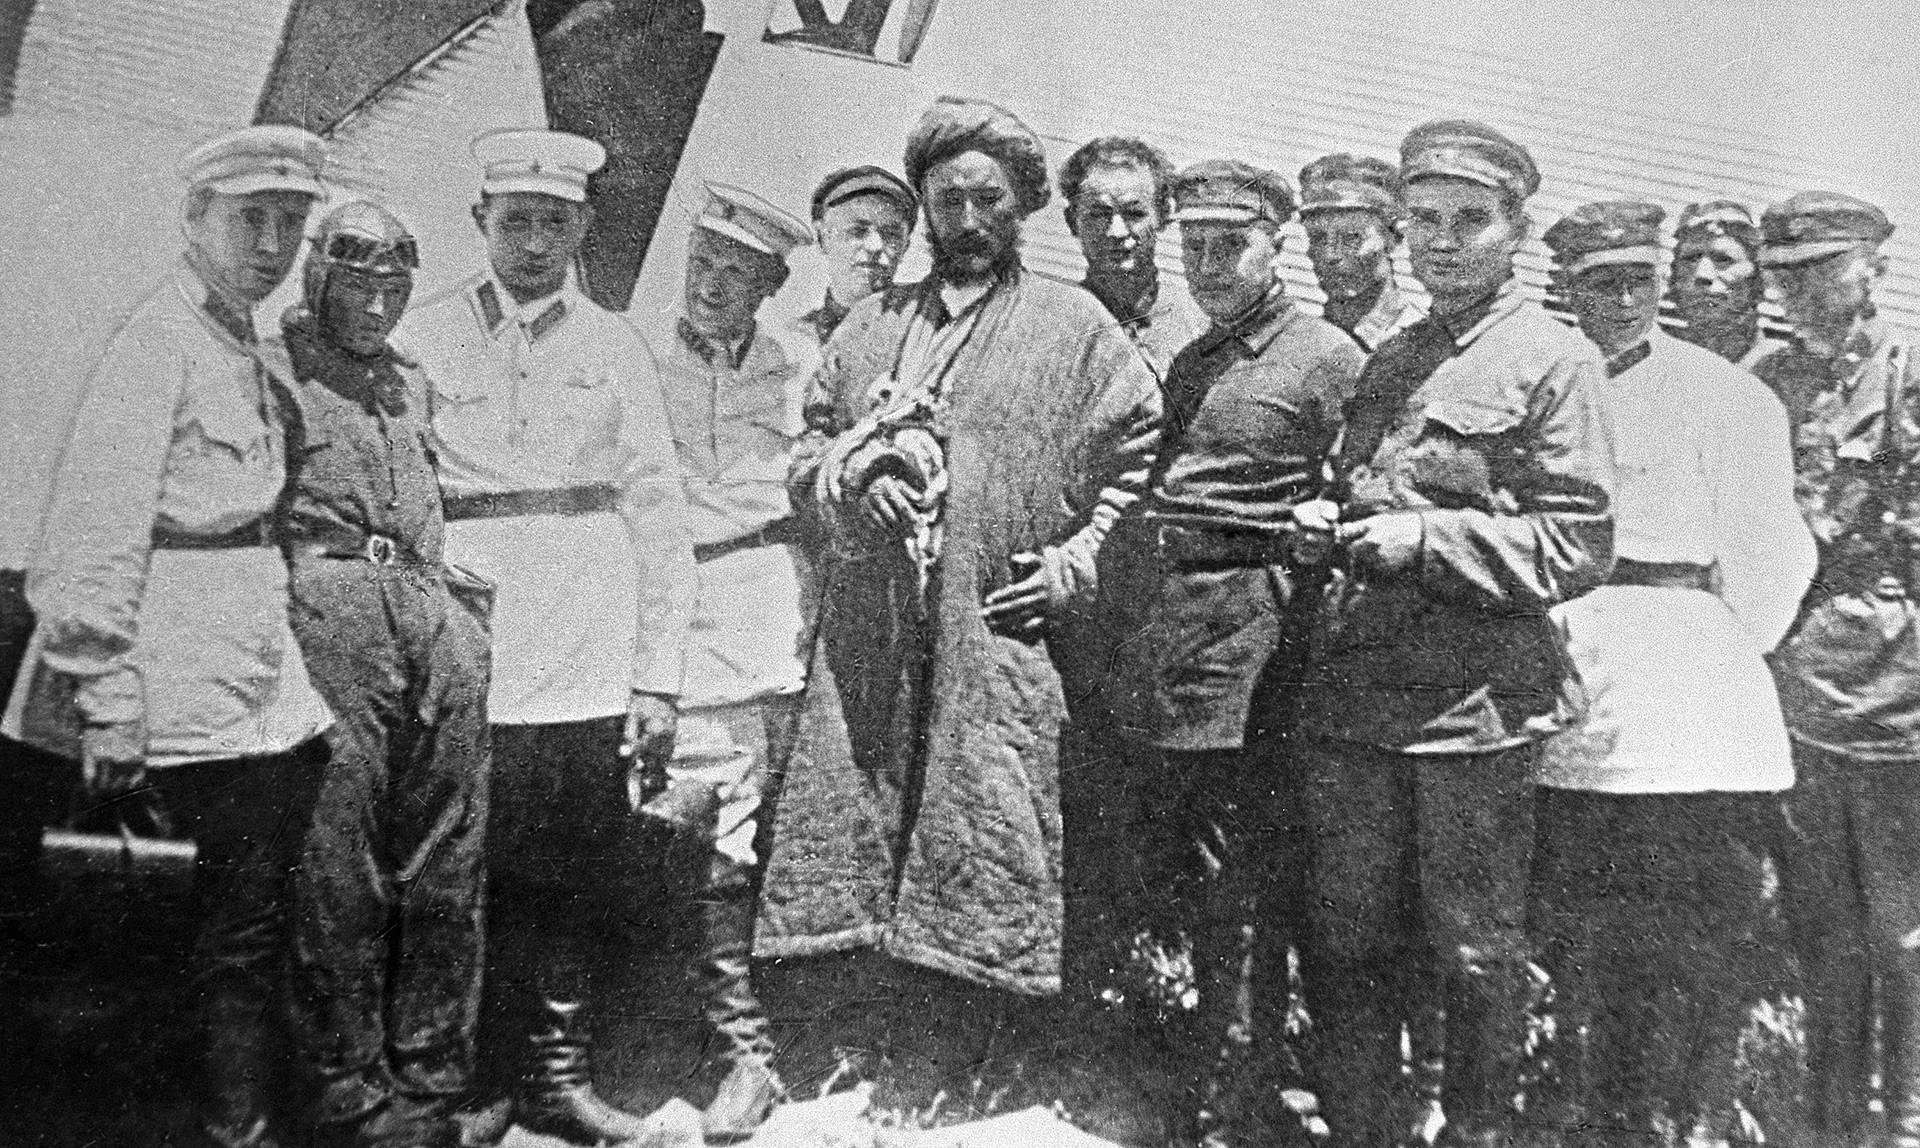 Skupina pripadnika Ujedinjene državne političke uprave s Ibrahimom Bekom (u sredini), vođom oružanog antiboljševičkog otpora.